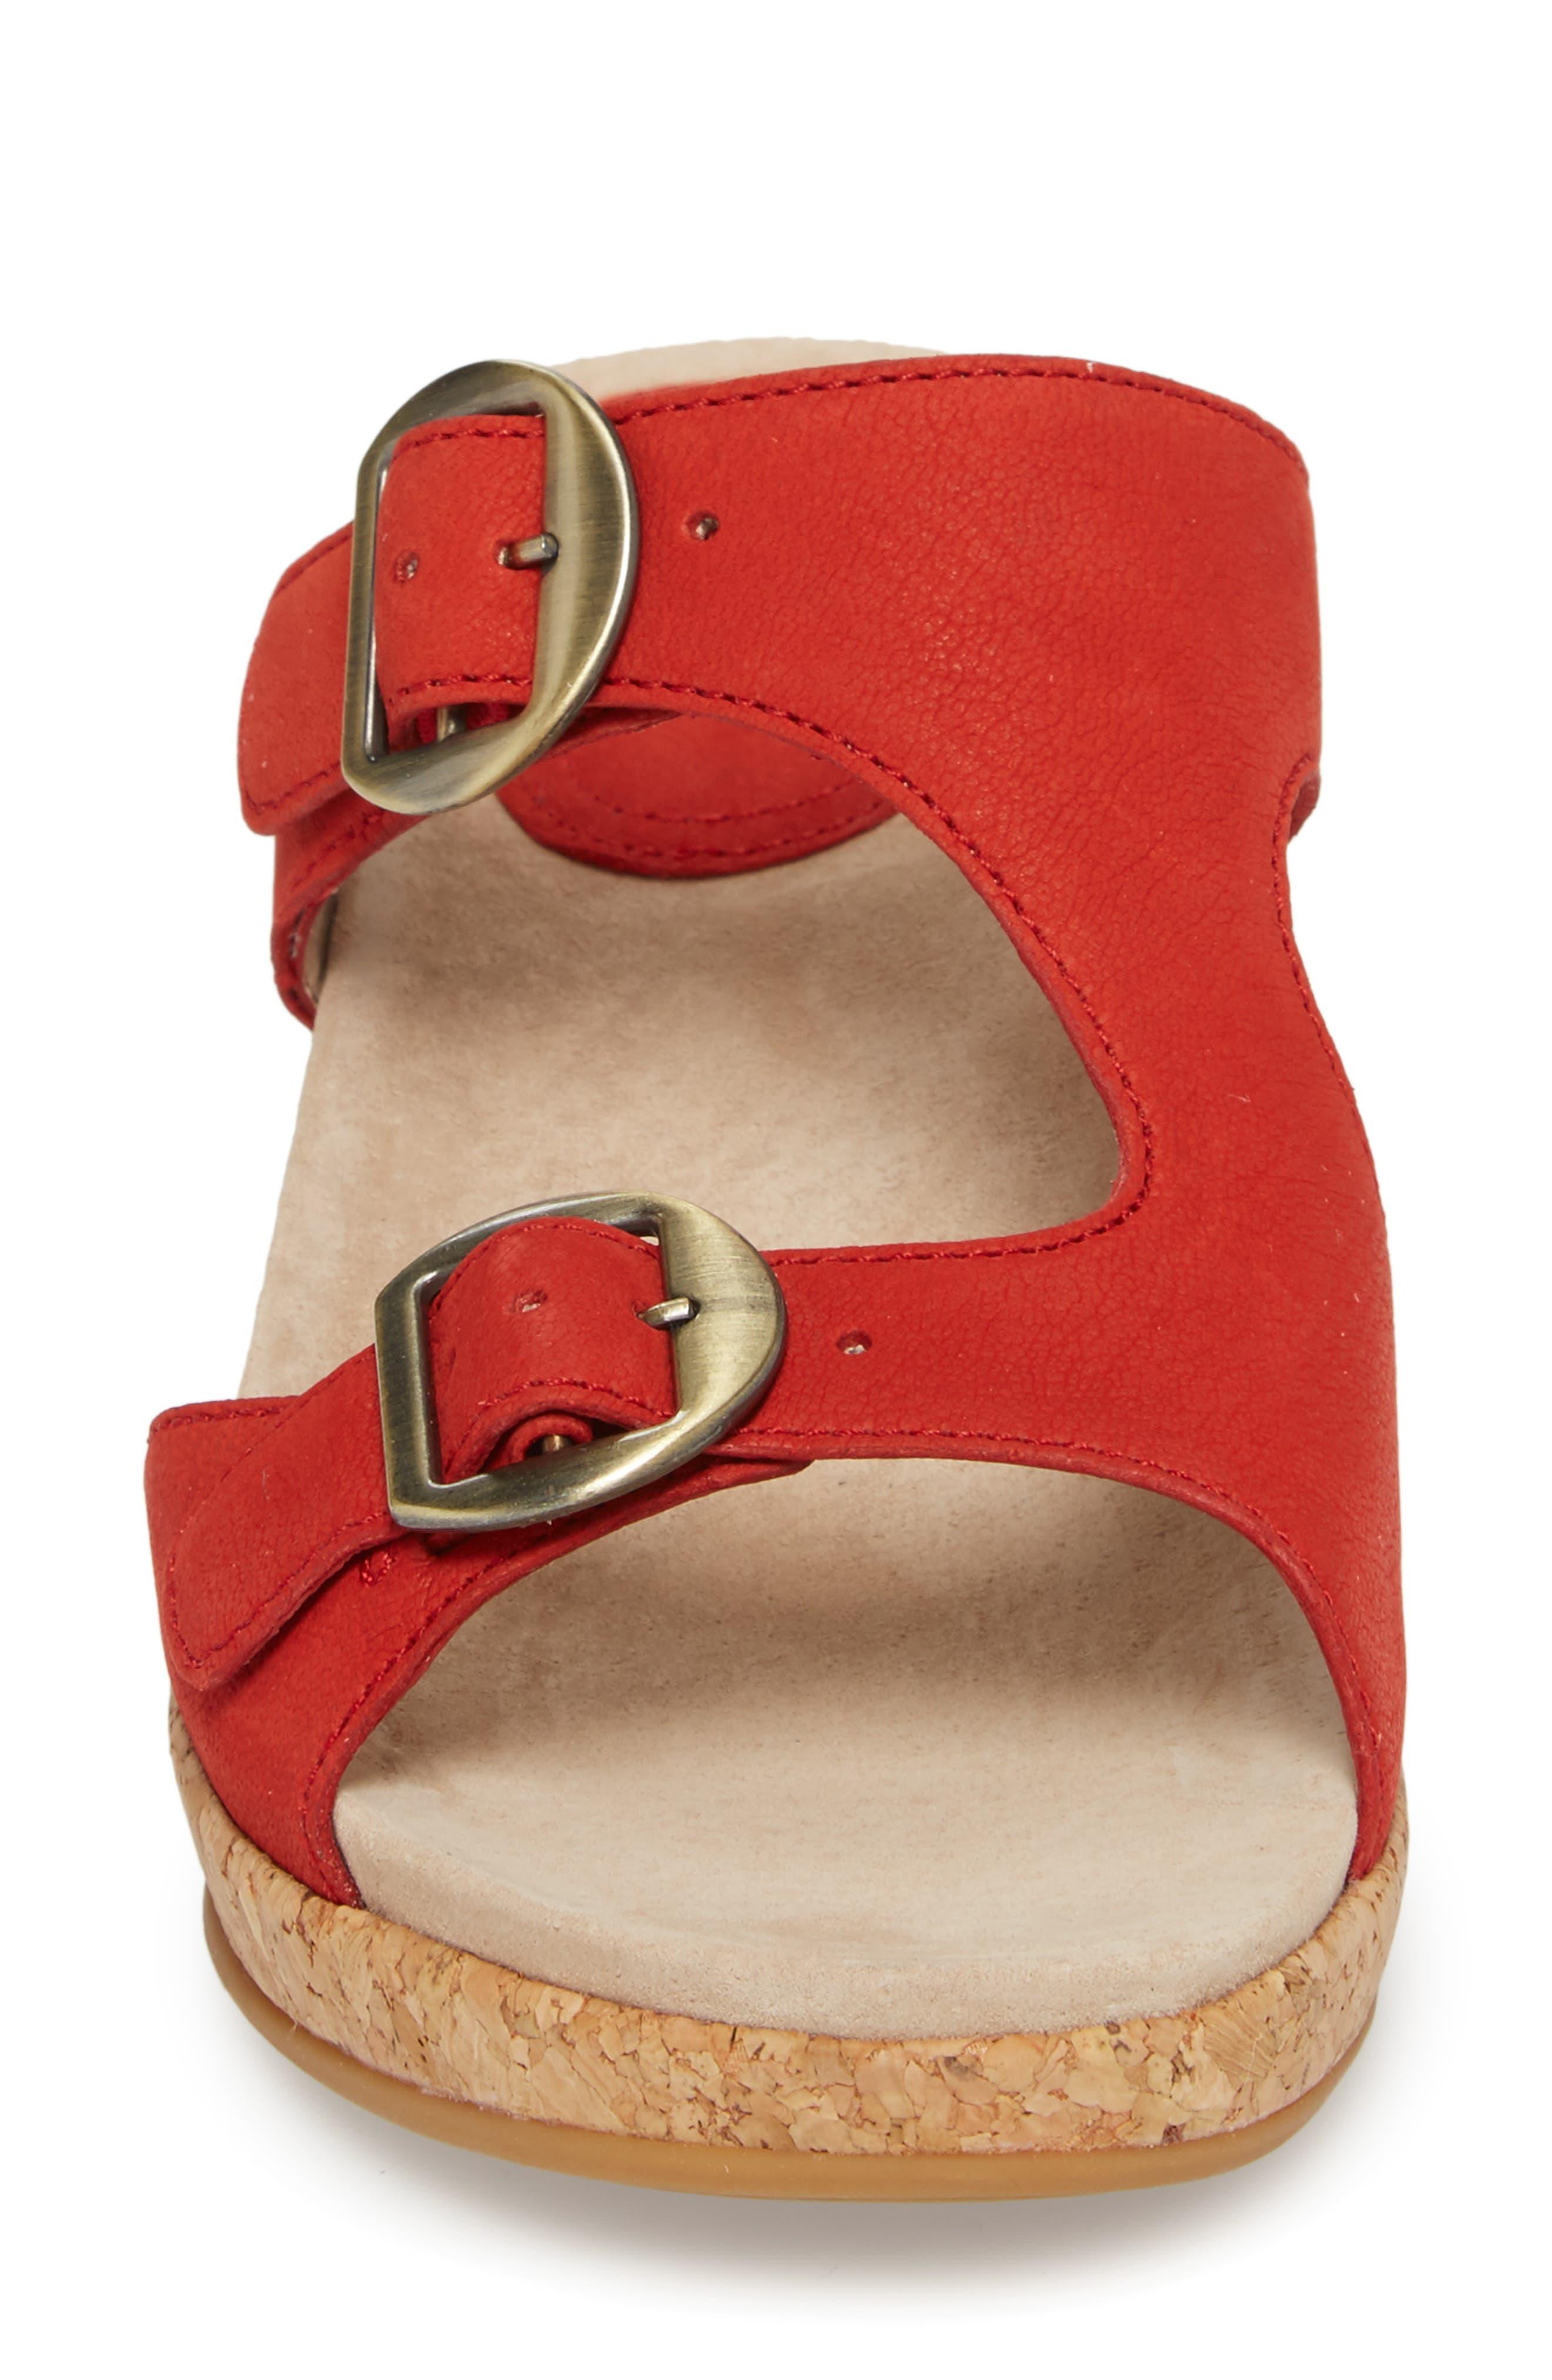 Carla Wedge Slide Sandal,                             Alternate thumbnail 4, color,                             Tomato Milled Nubuck Leather